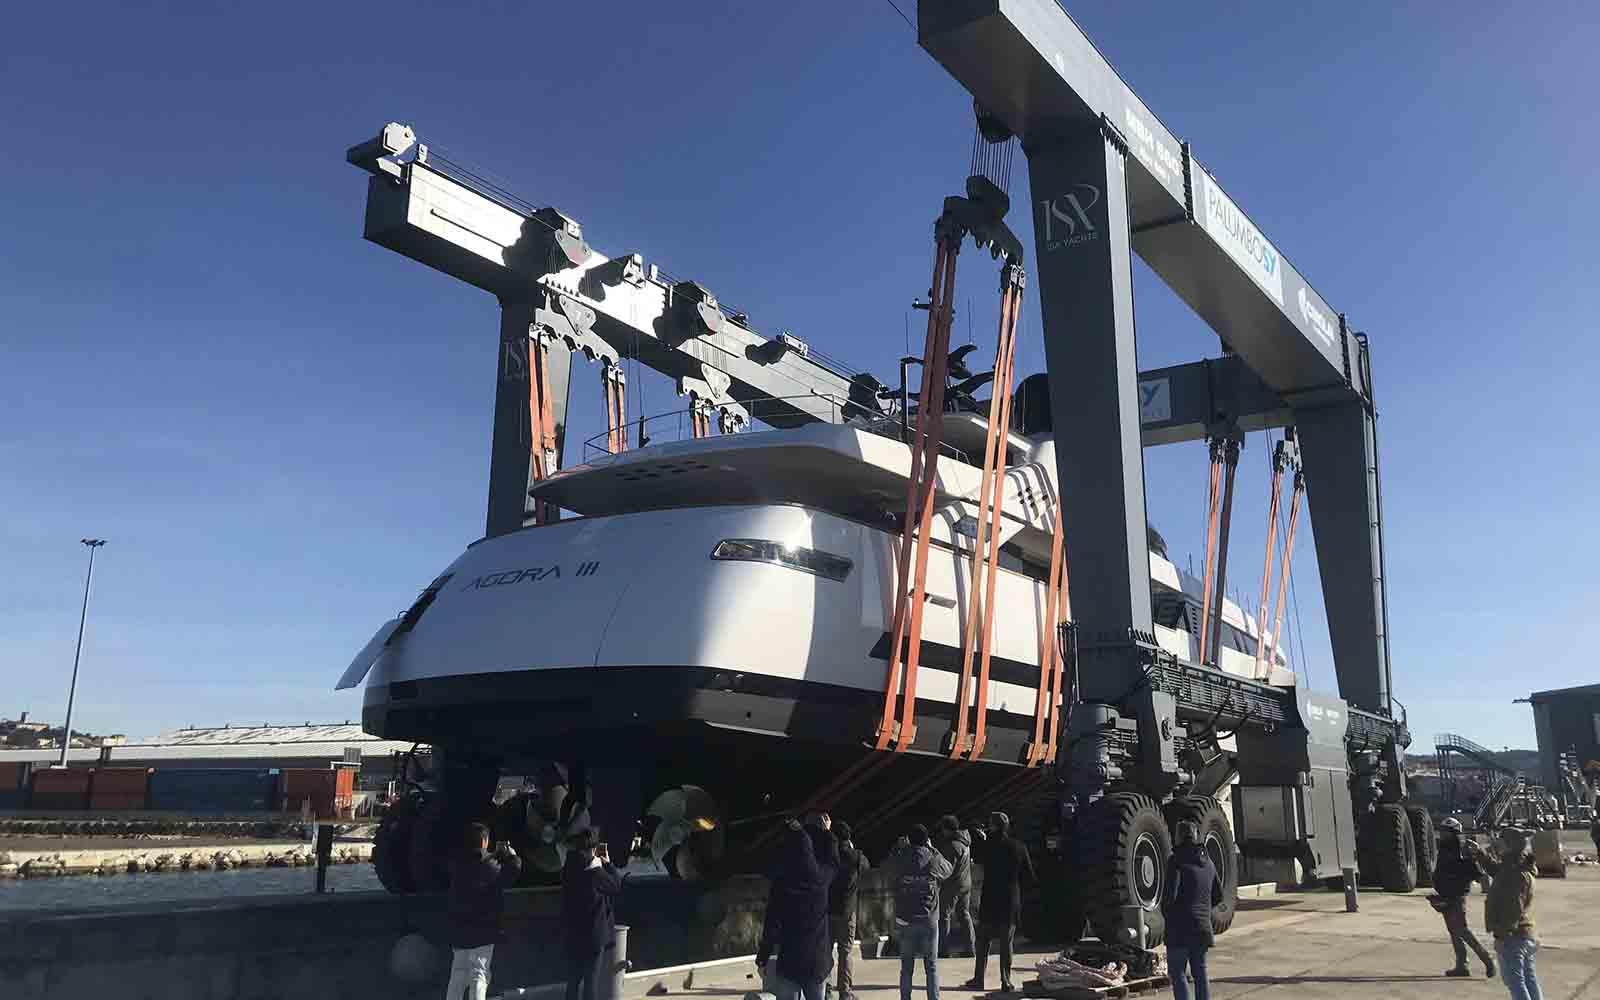 ISA Yachts Alloy 43 Agora III - boat shopping